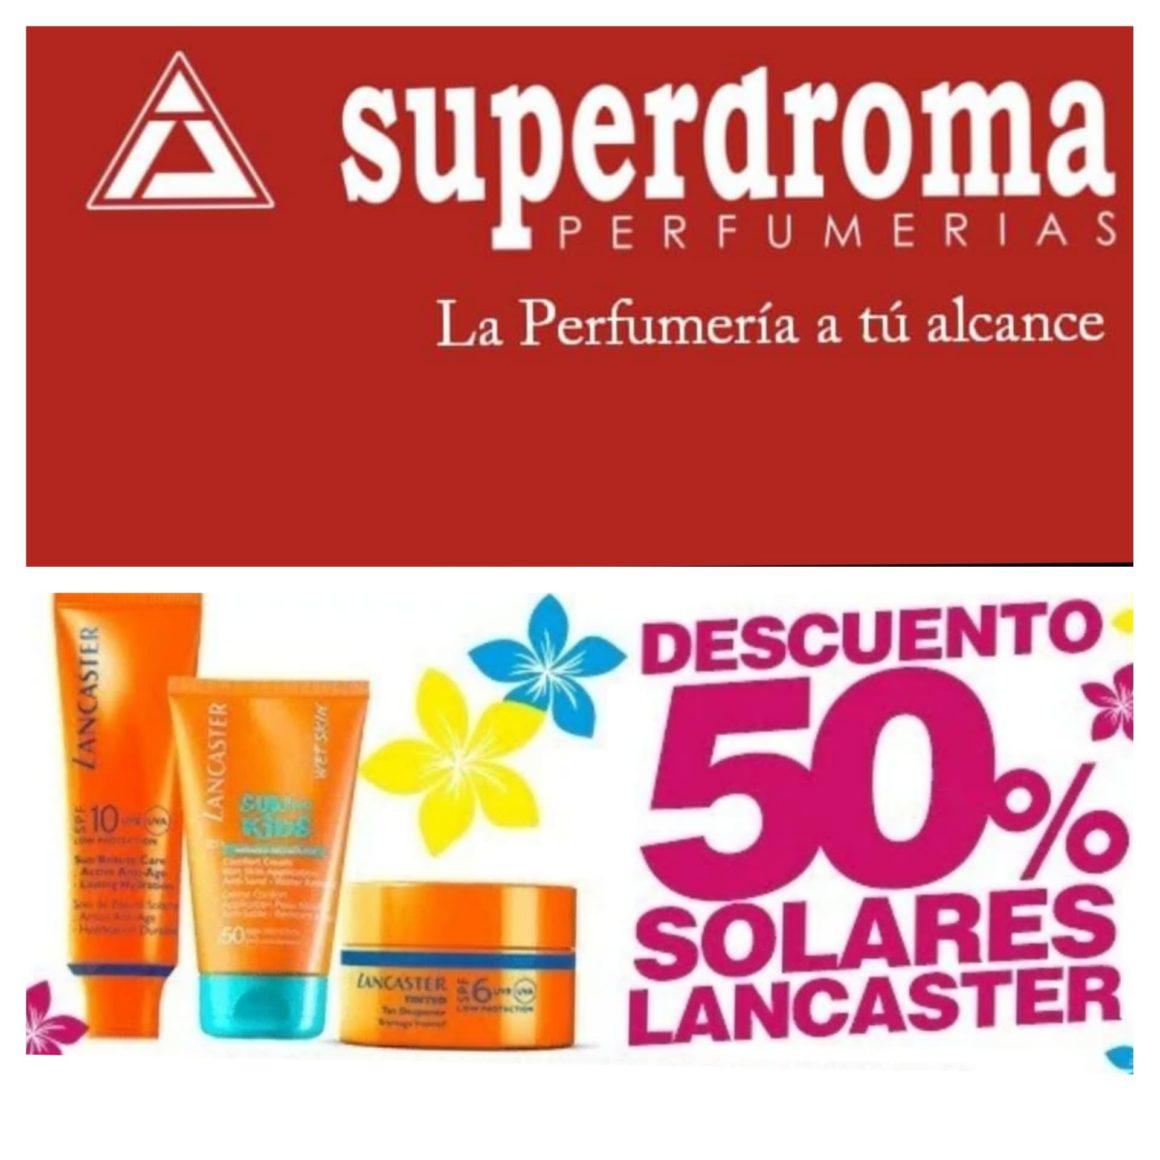 Solares Lancaster Superdroma